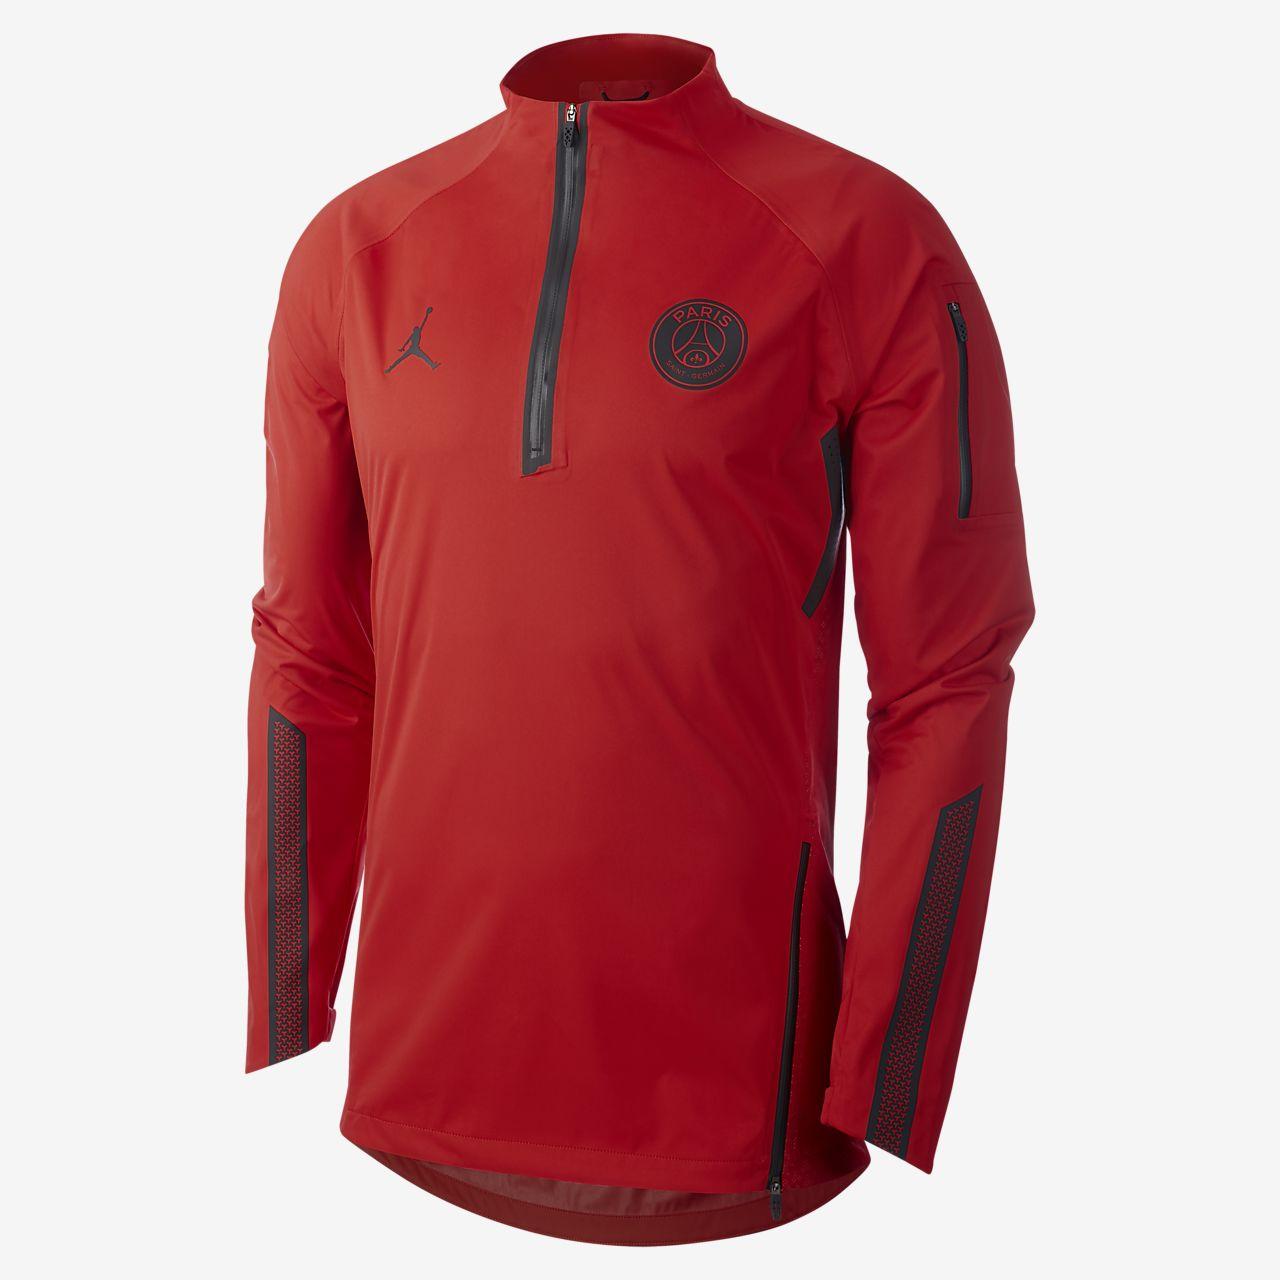 ed11e3c44cfd5e PSG AeroShield Strike Drill Men s Long-Sleeve Football Top. Nike.com AU